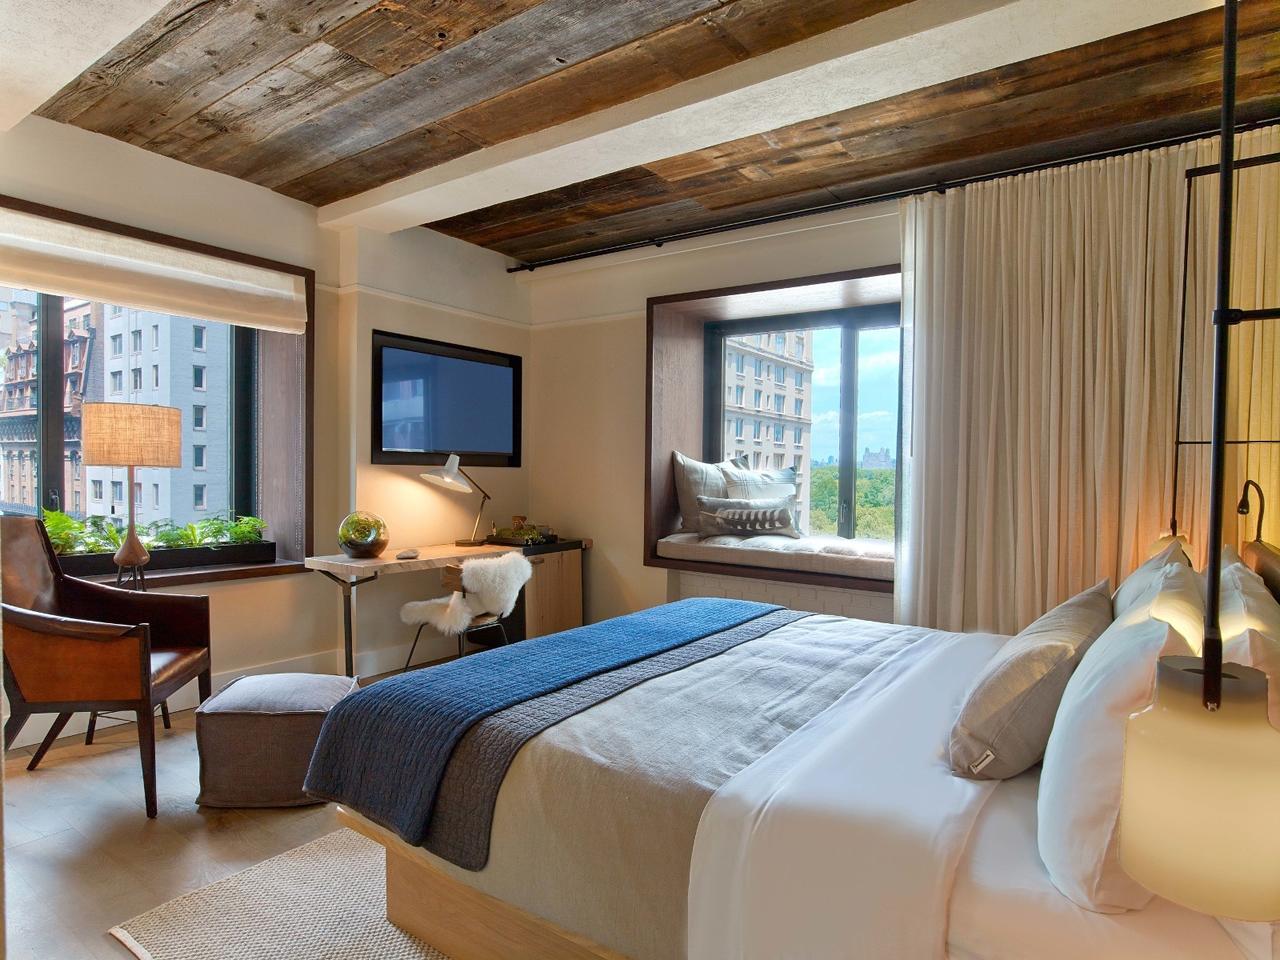 1-Hotel-Central-Park-in-New-York-City-2.jpg